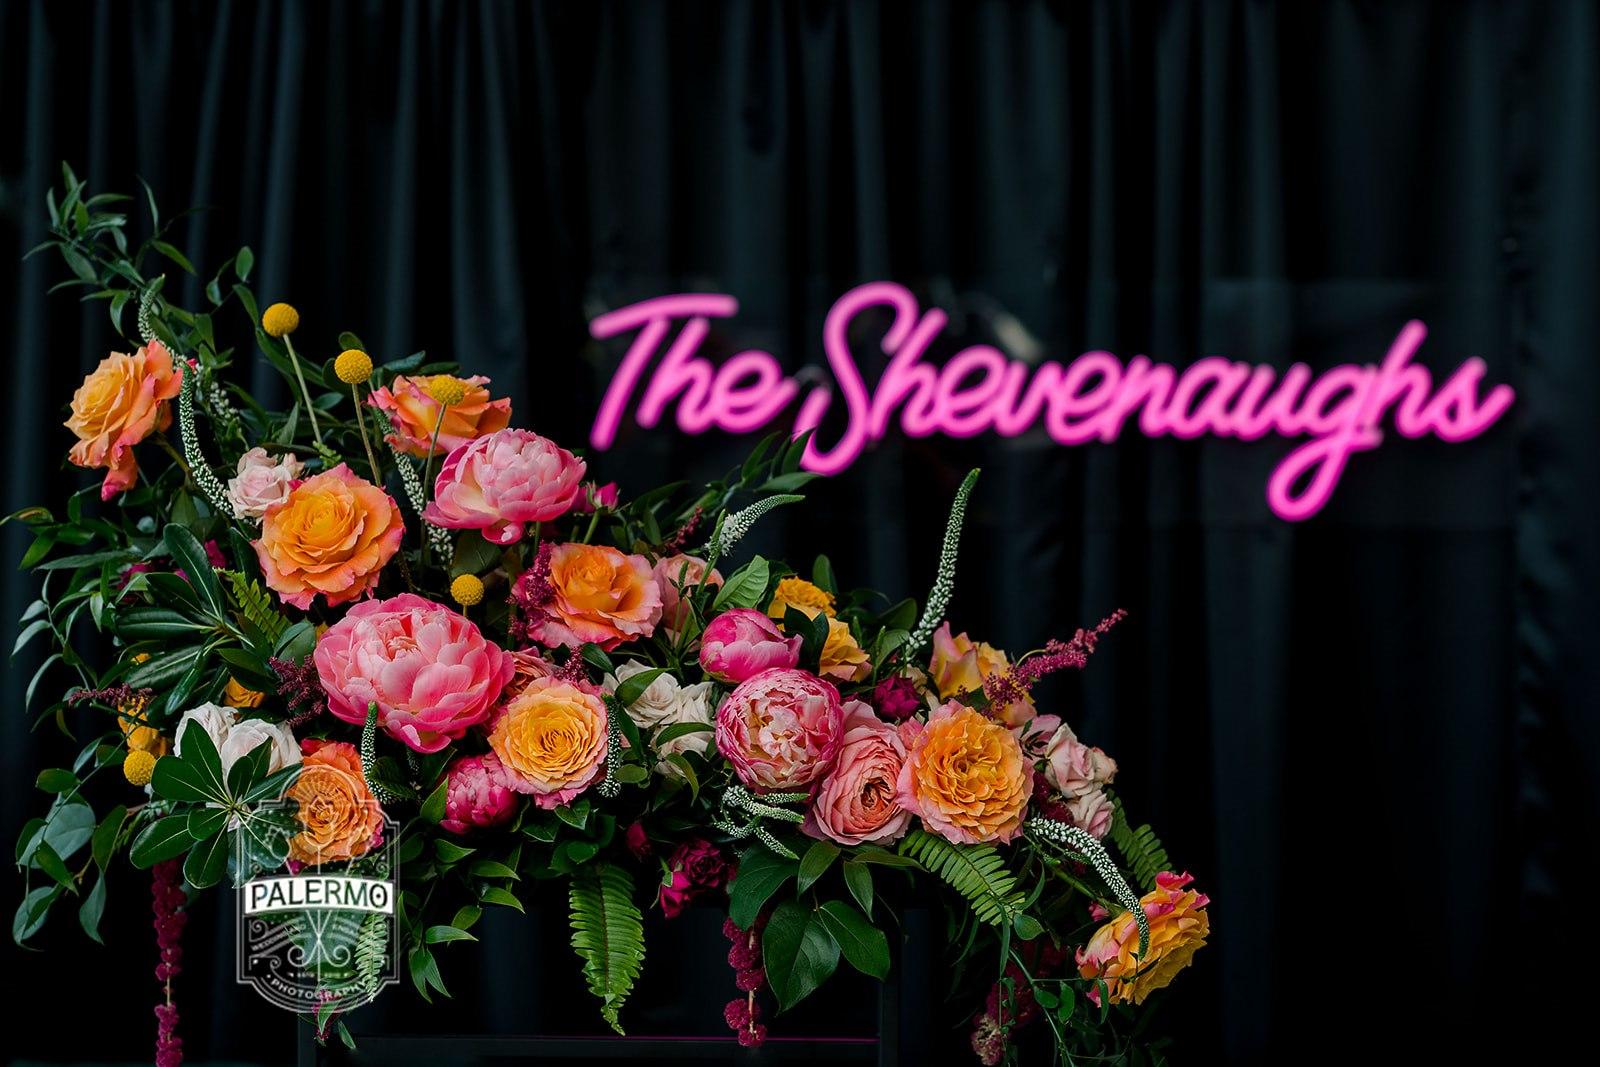 bridal couple neon sign wedding flowers ceremony arrangement